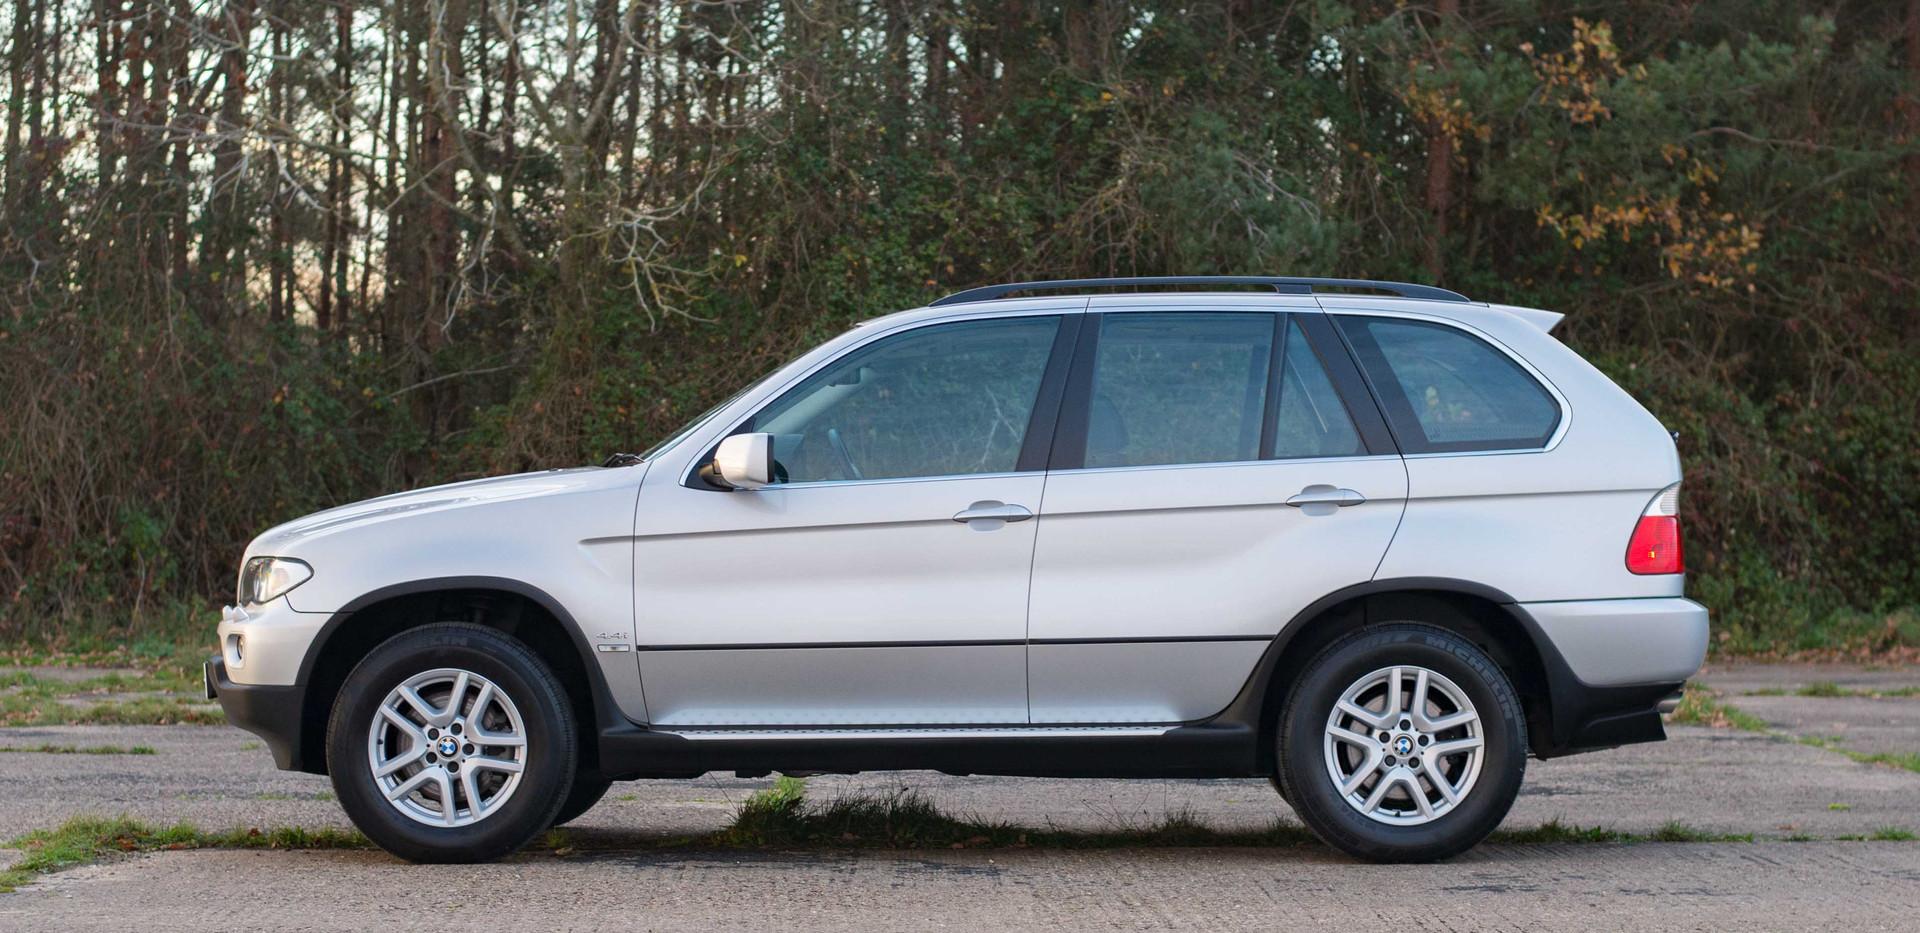 BMW E53 X5 4.4i For Sale UK London  (41